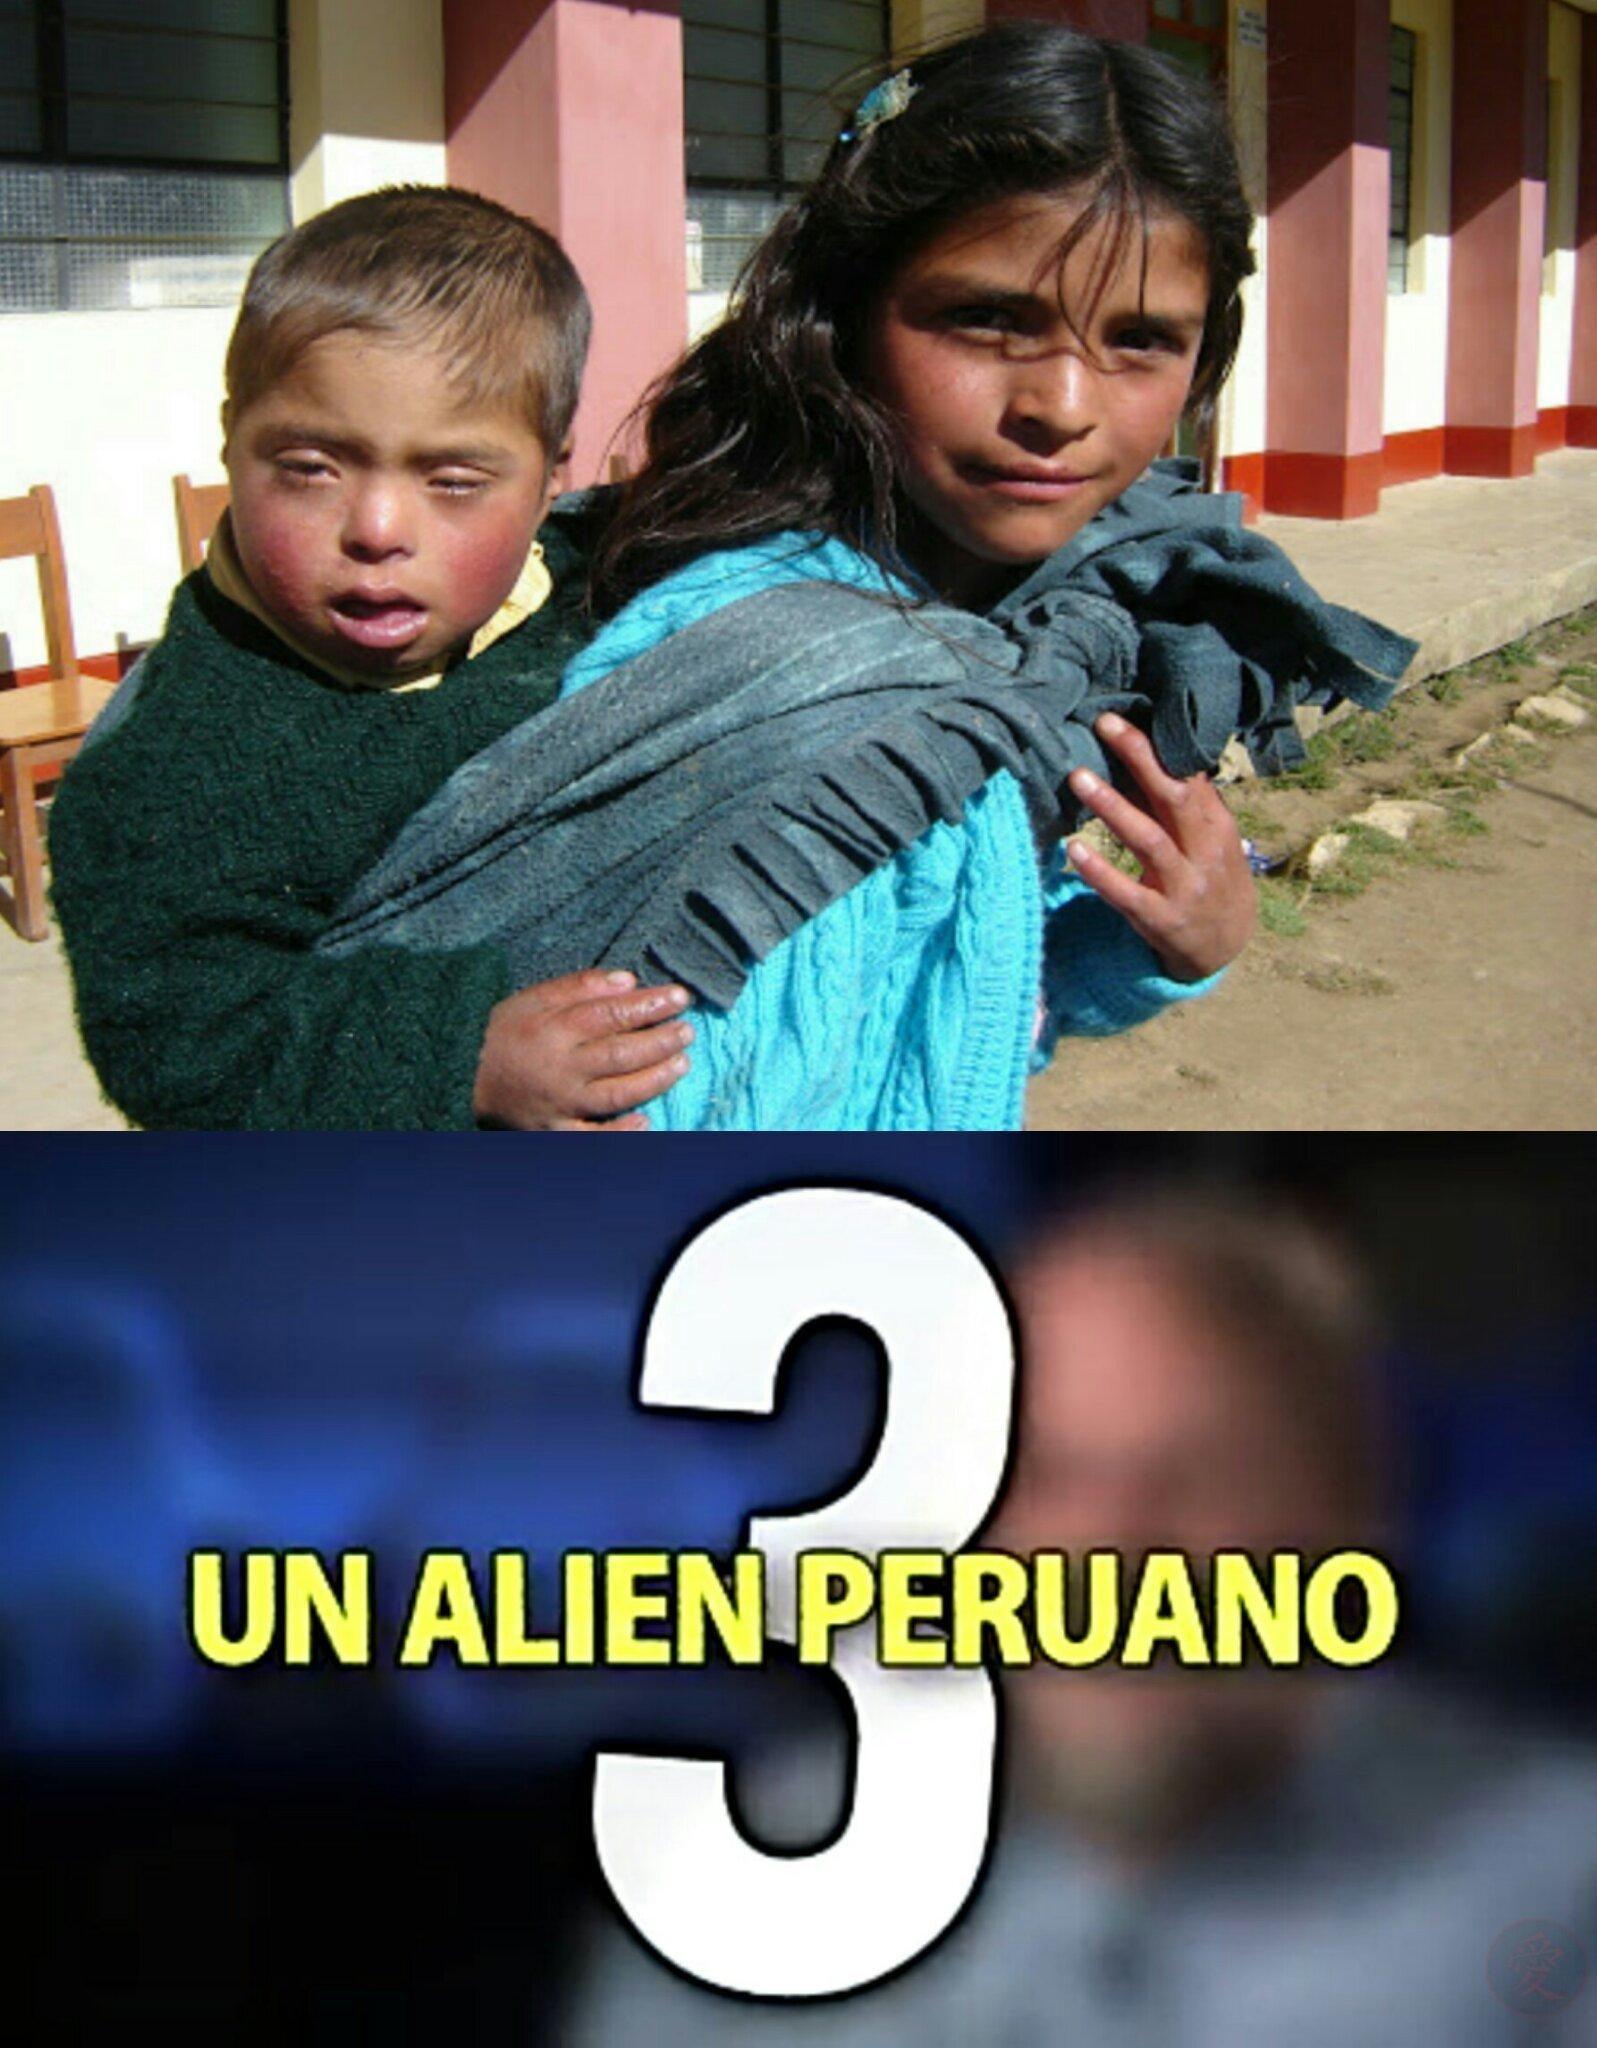 Ouuu re extraterrestre - meme